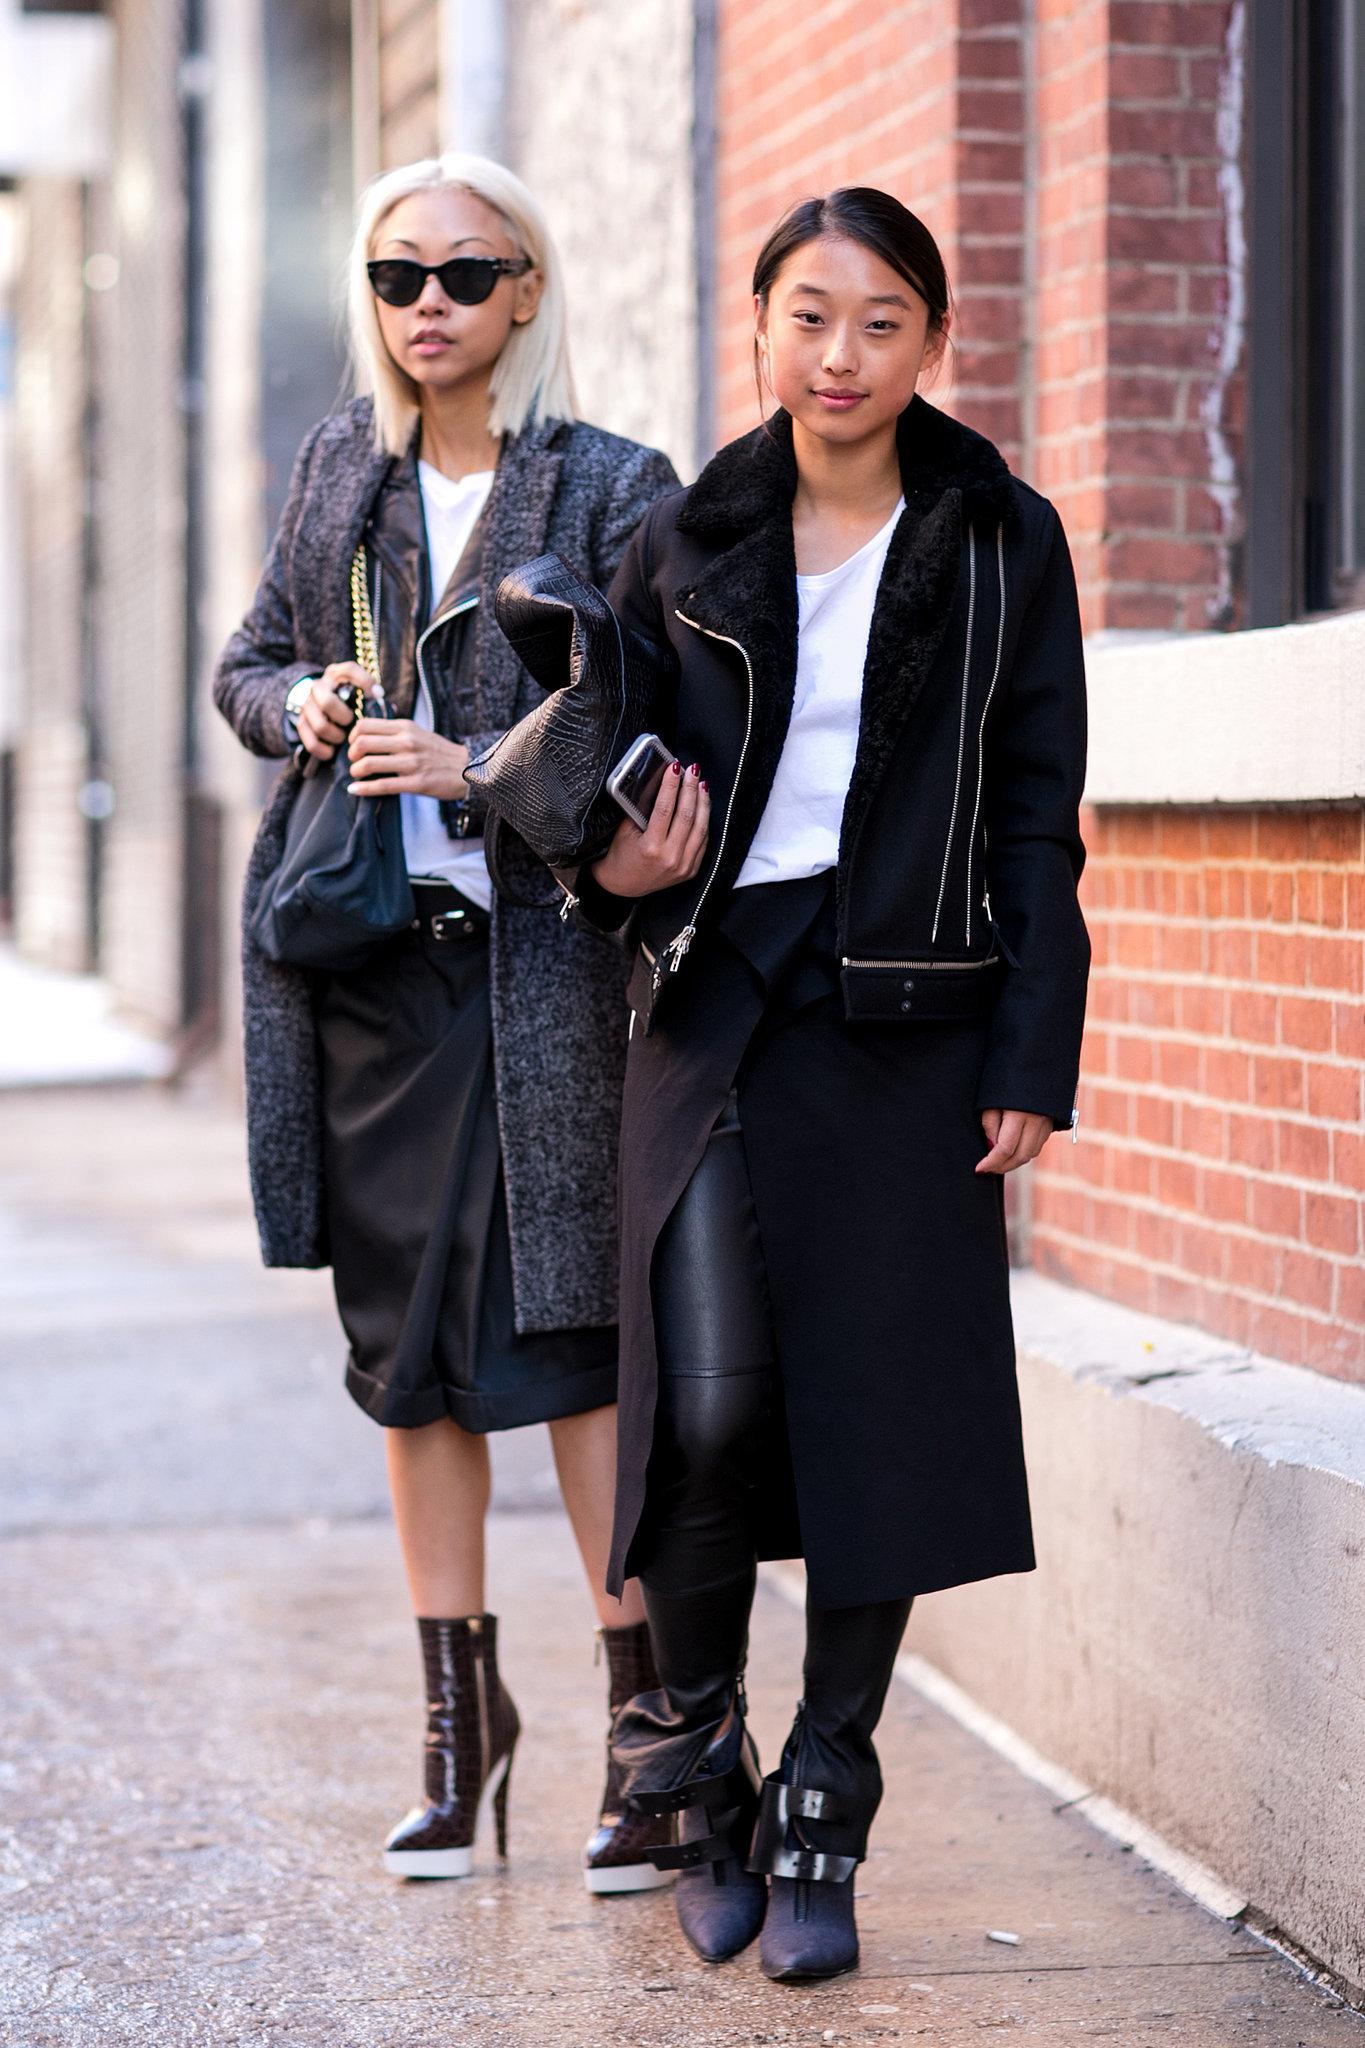 NYFW-Street-Style-Day-2-9